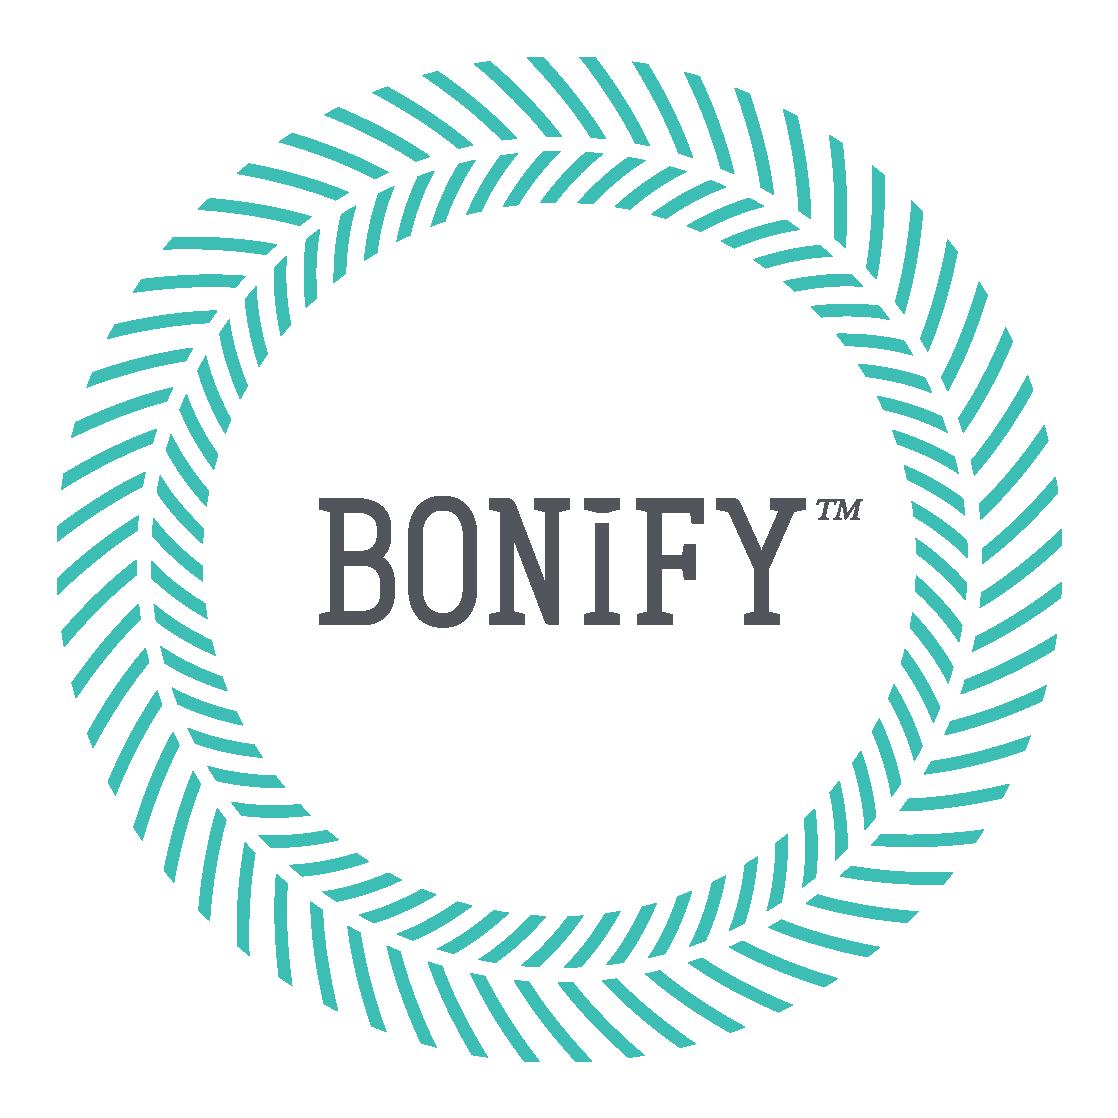 Bonify | Brand